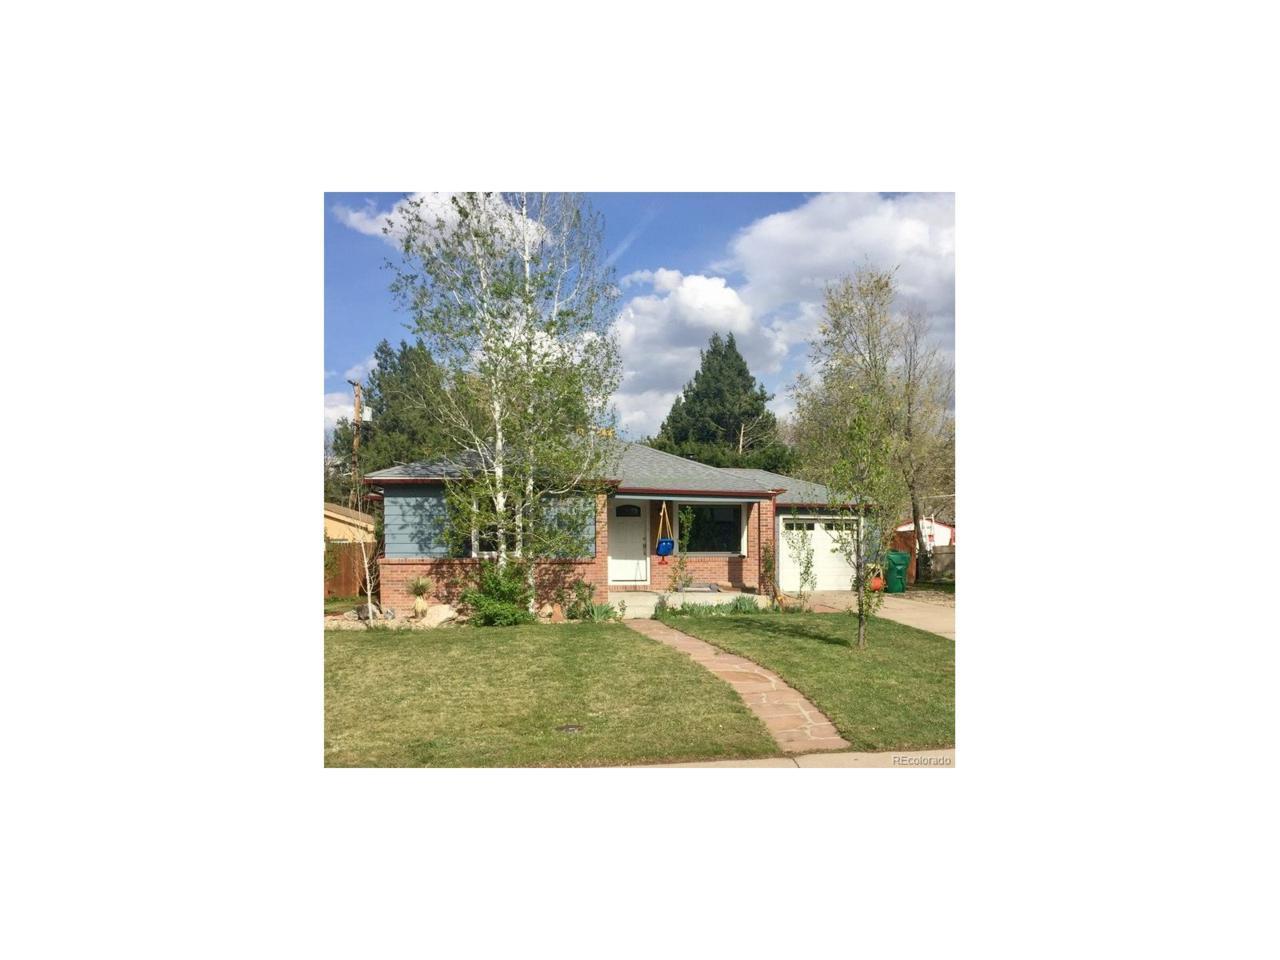 2760 S Elm Street, Denver, CO 80222 (MLS #5973840) :: 8z Real Estate